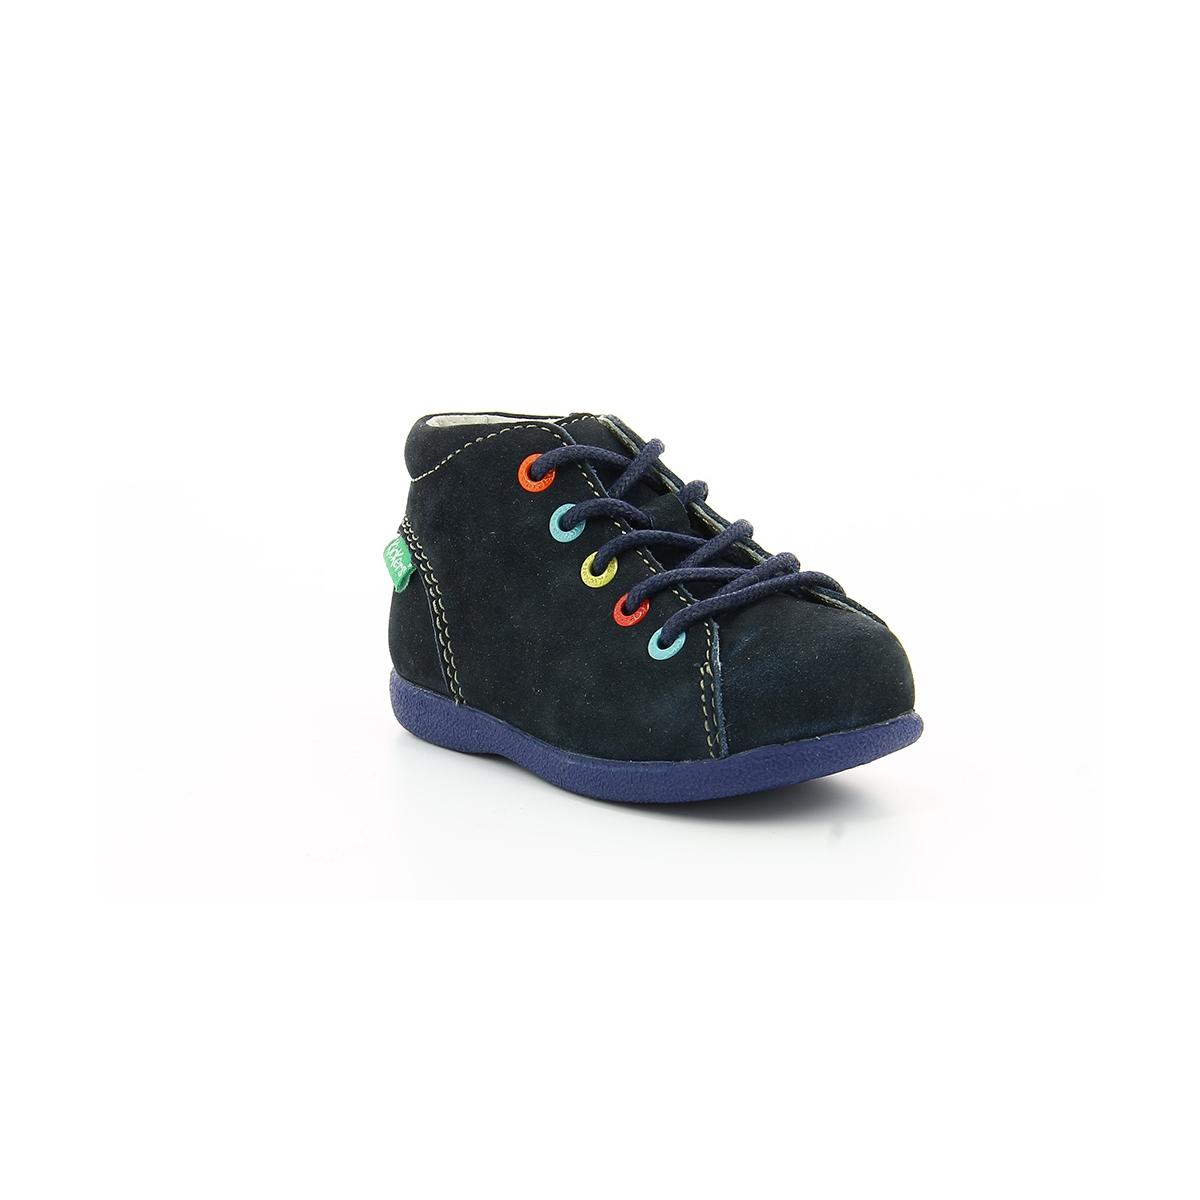 609ca8e1e8e5e3 Kid's shoes BABYSTAD NAVY - Kickers